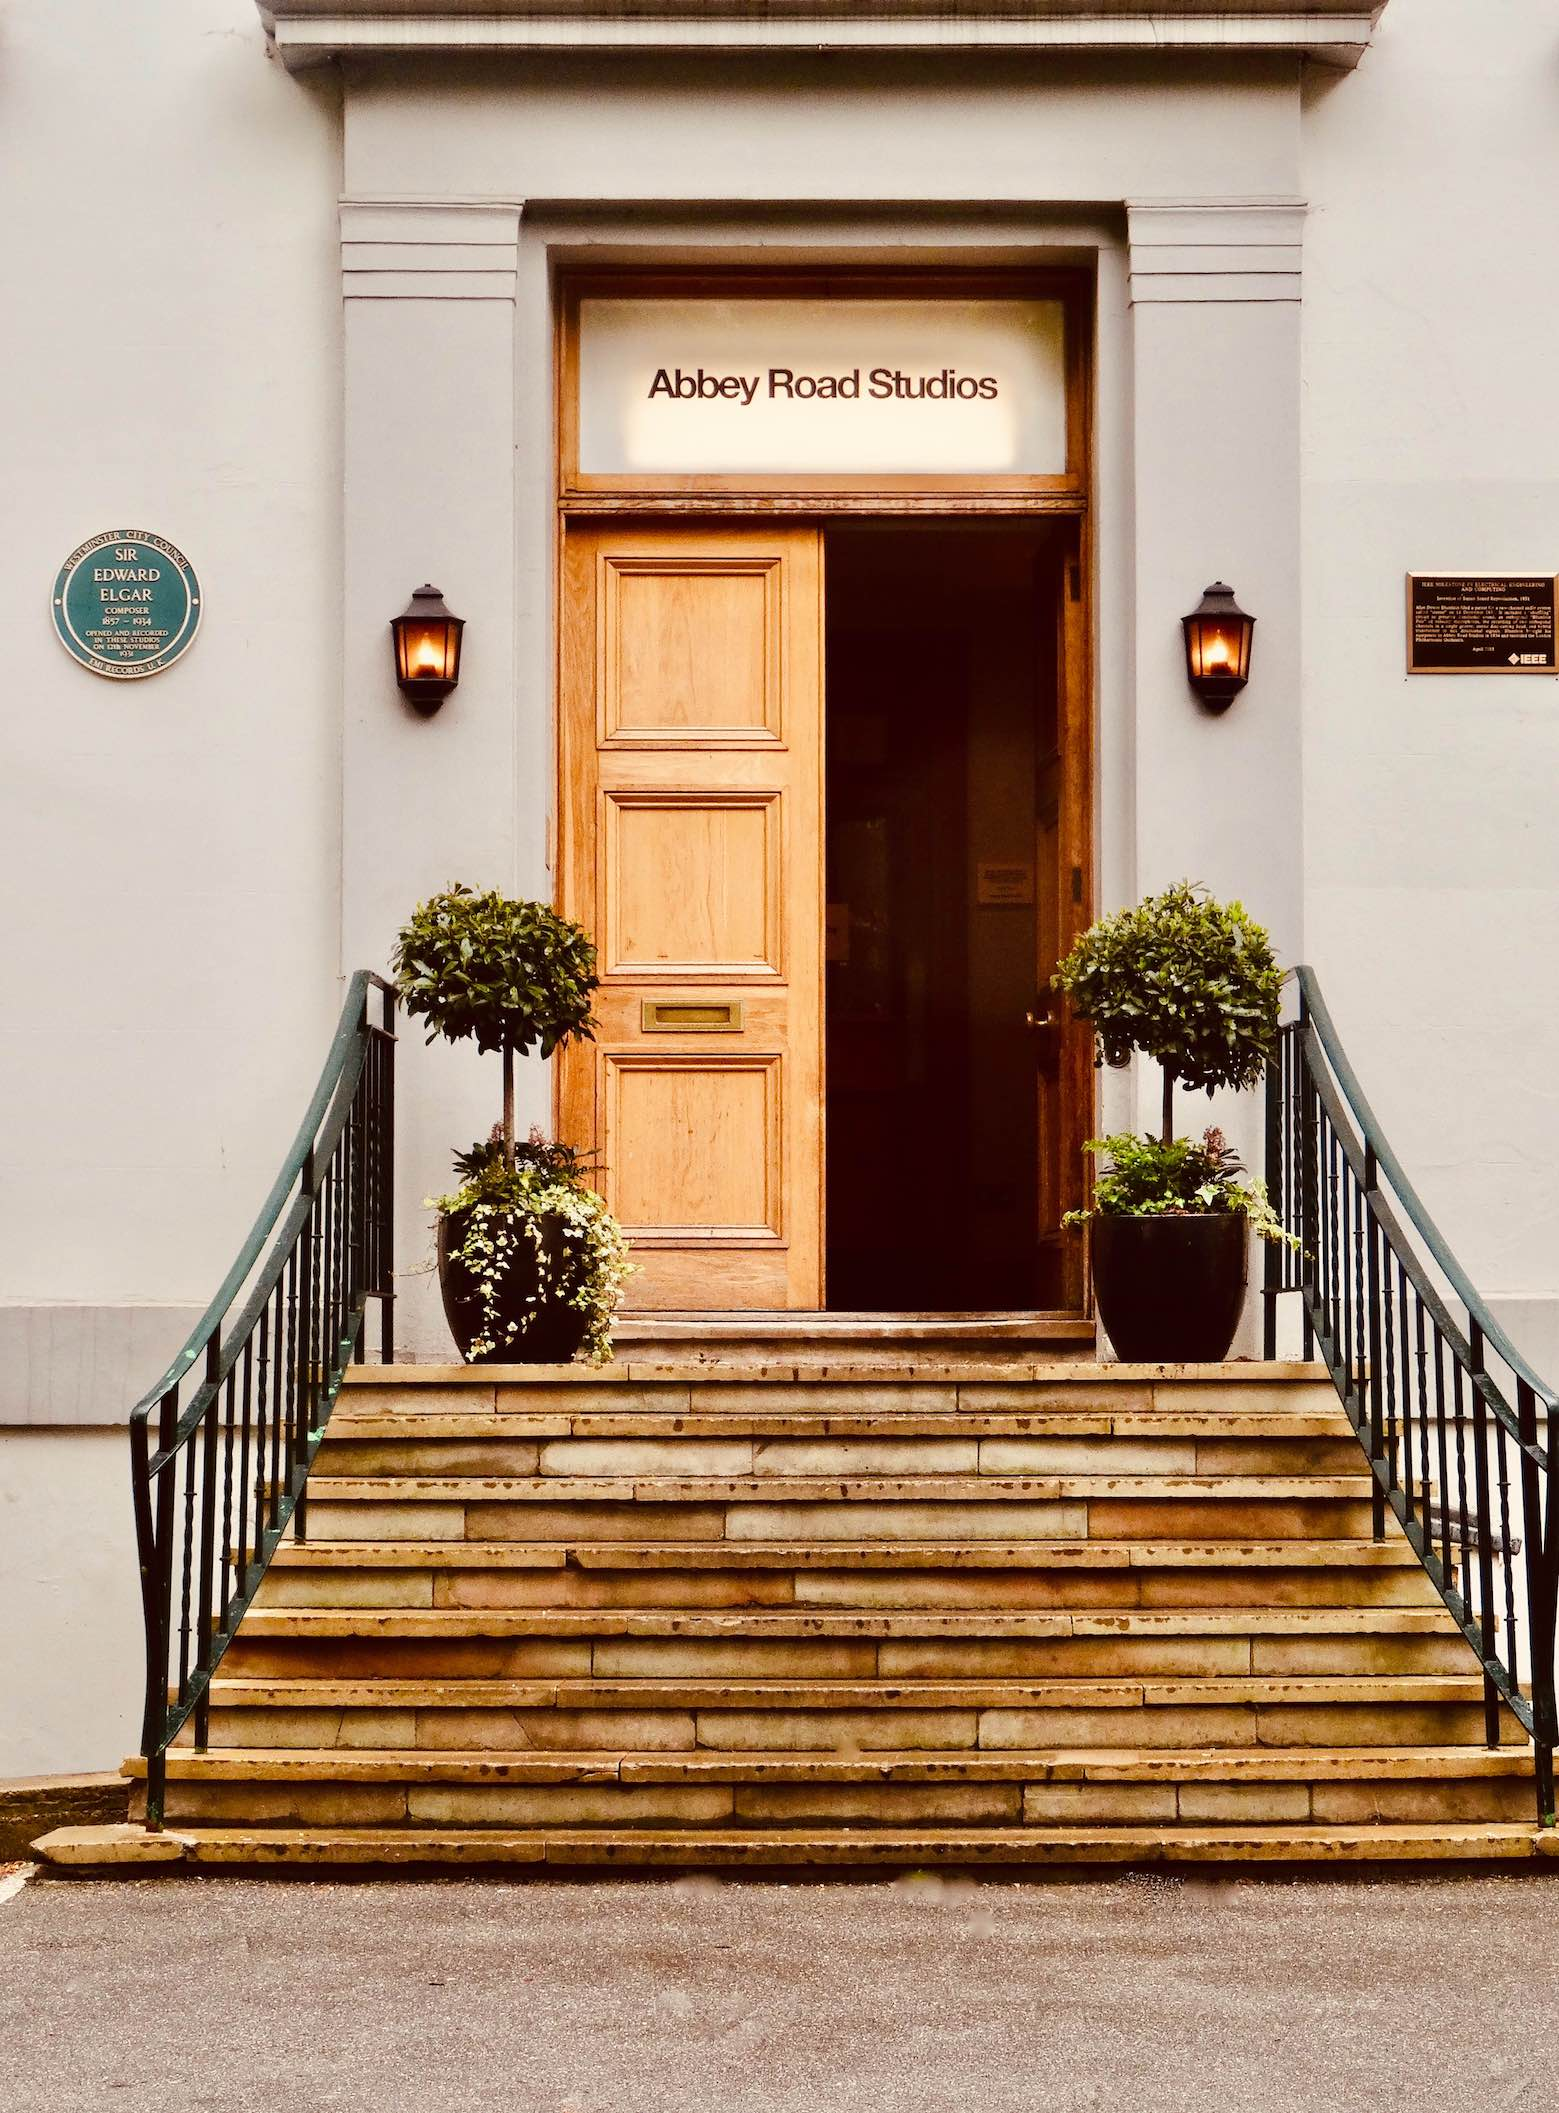 Entrance steps Abbey Road Studios.